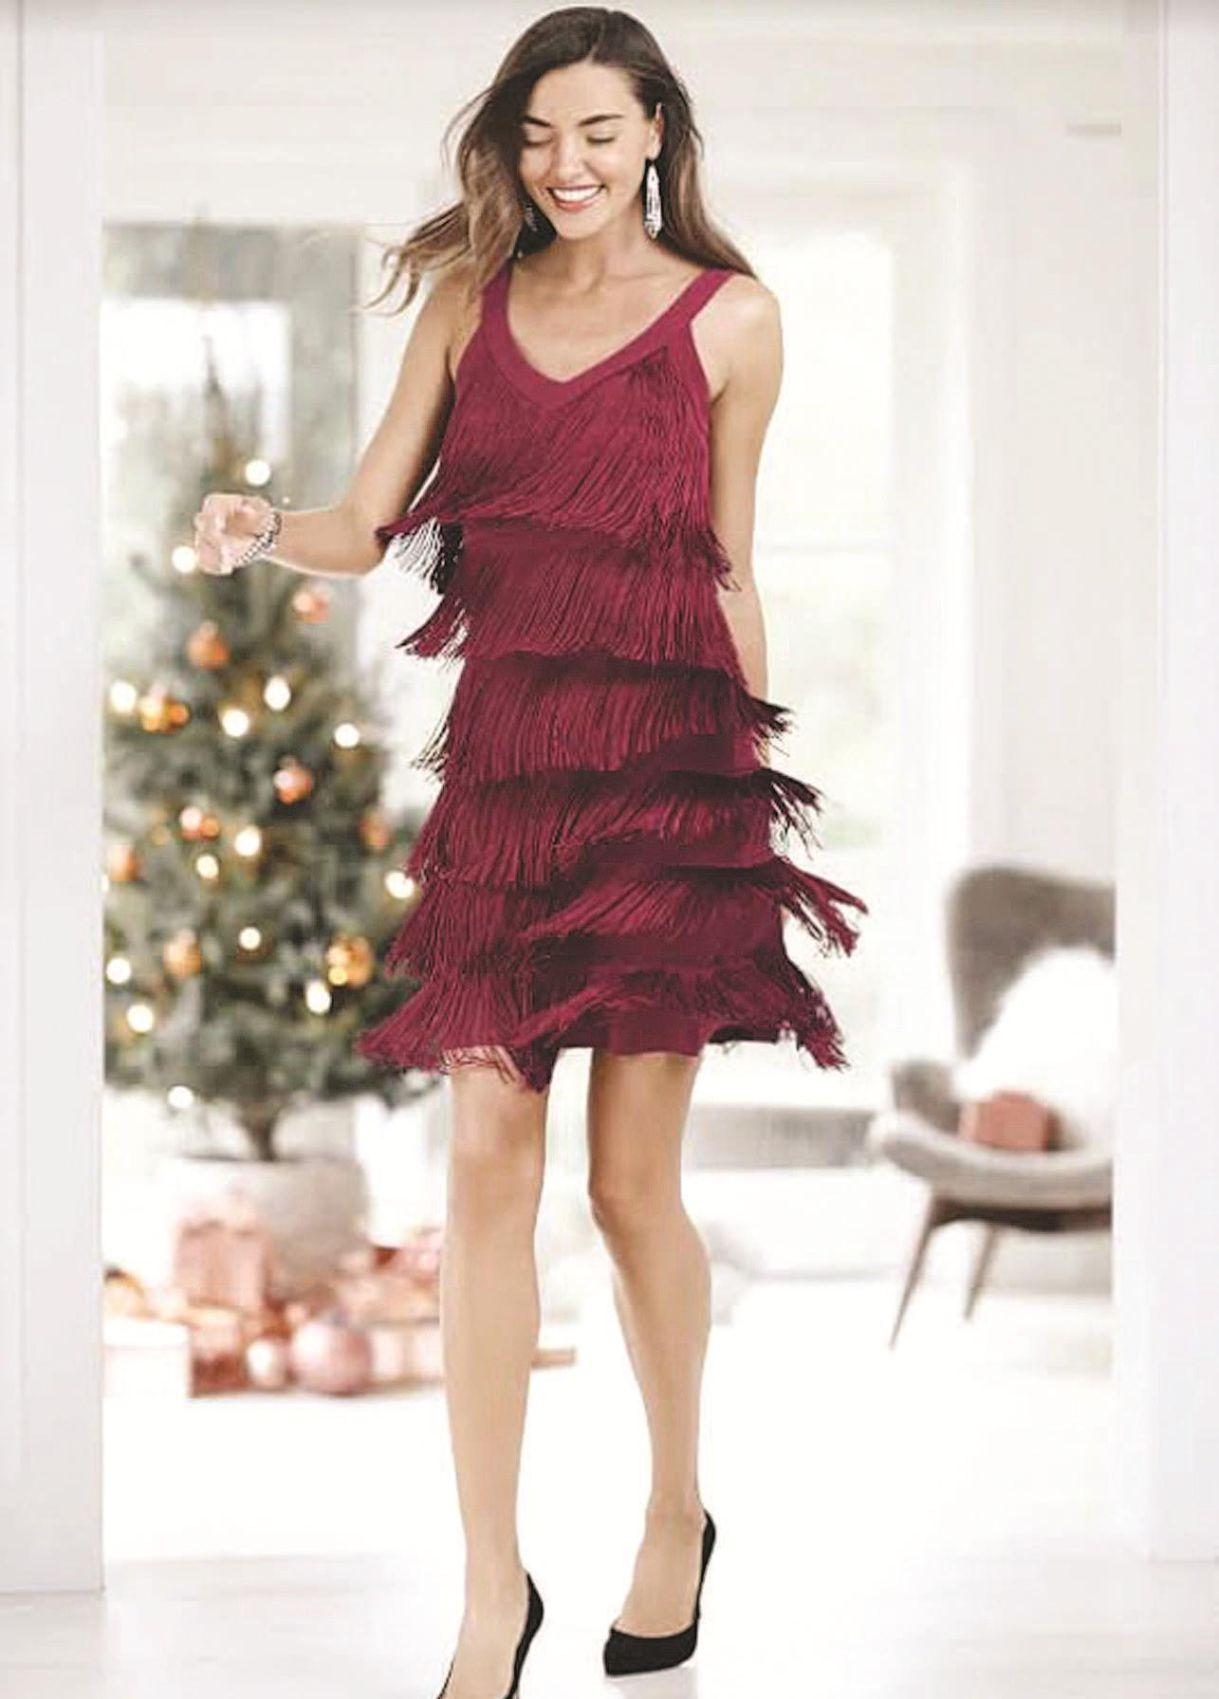 Festive Cocktail Dresses